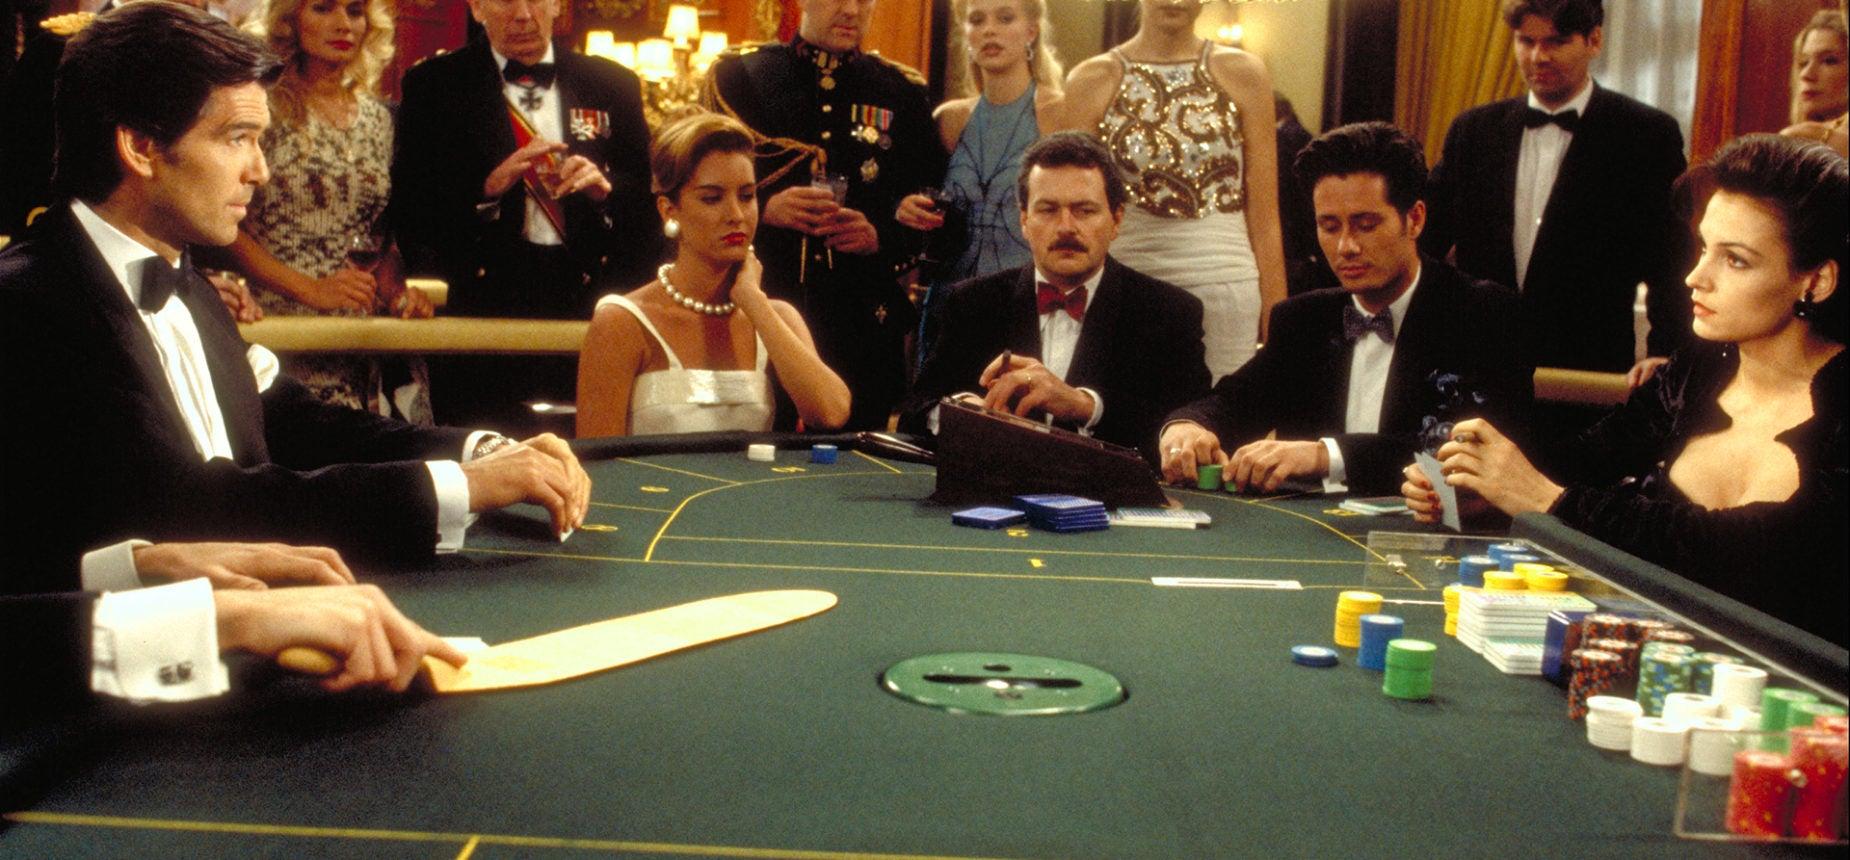 007's Greatest Gambles